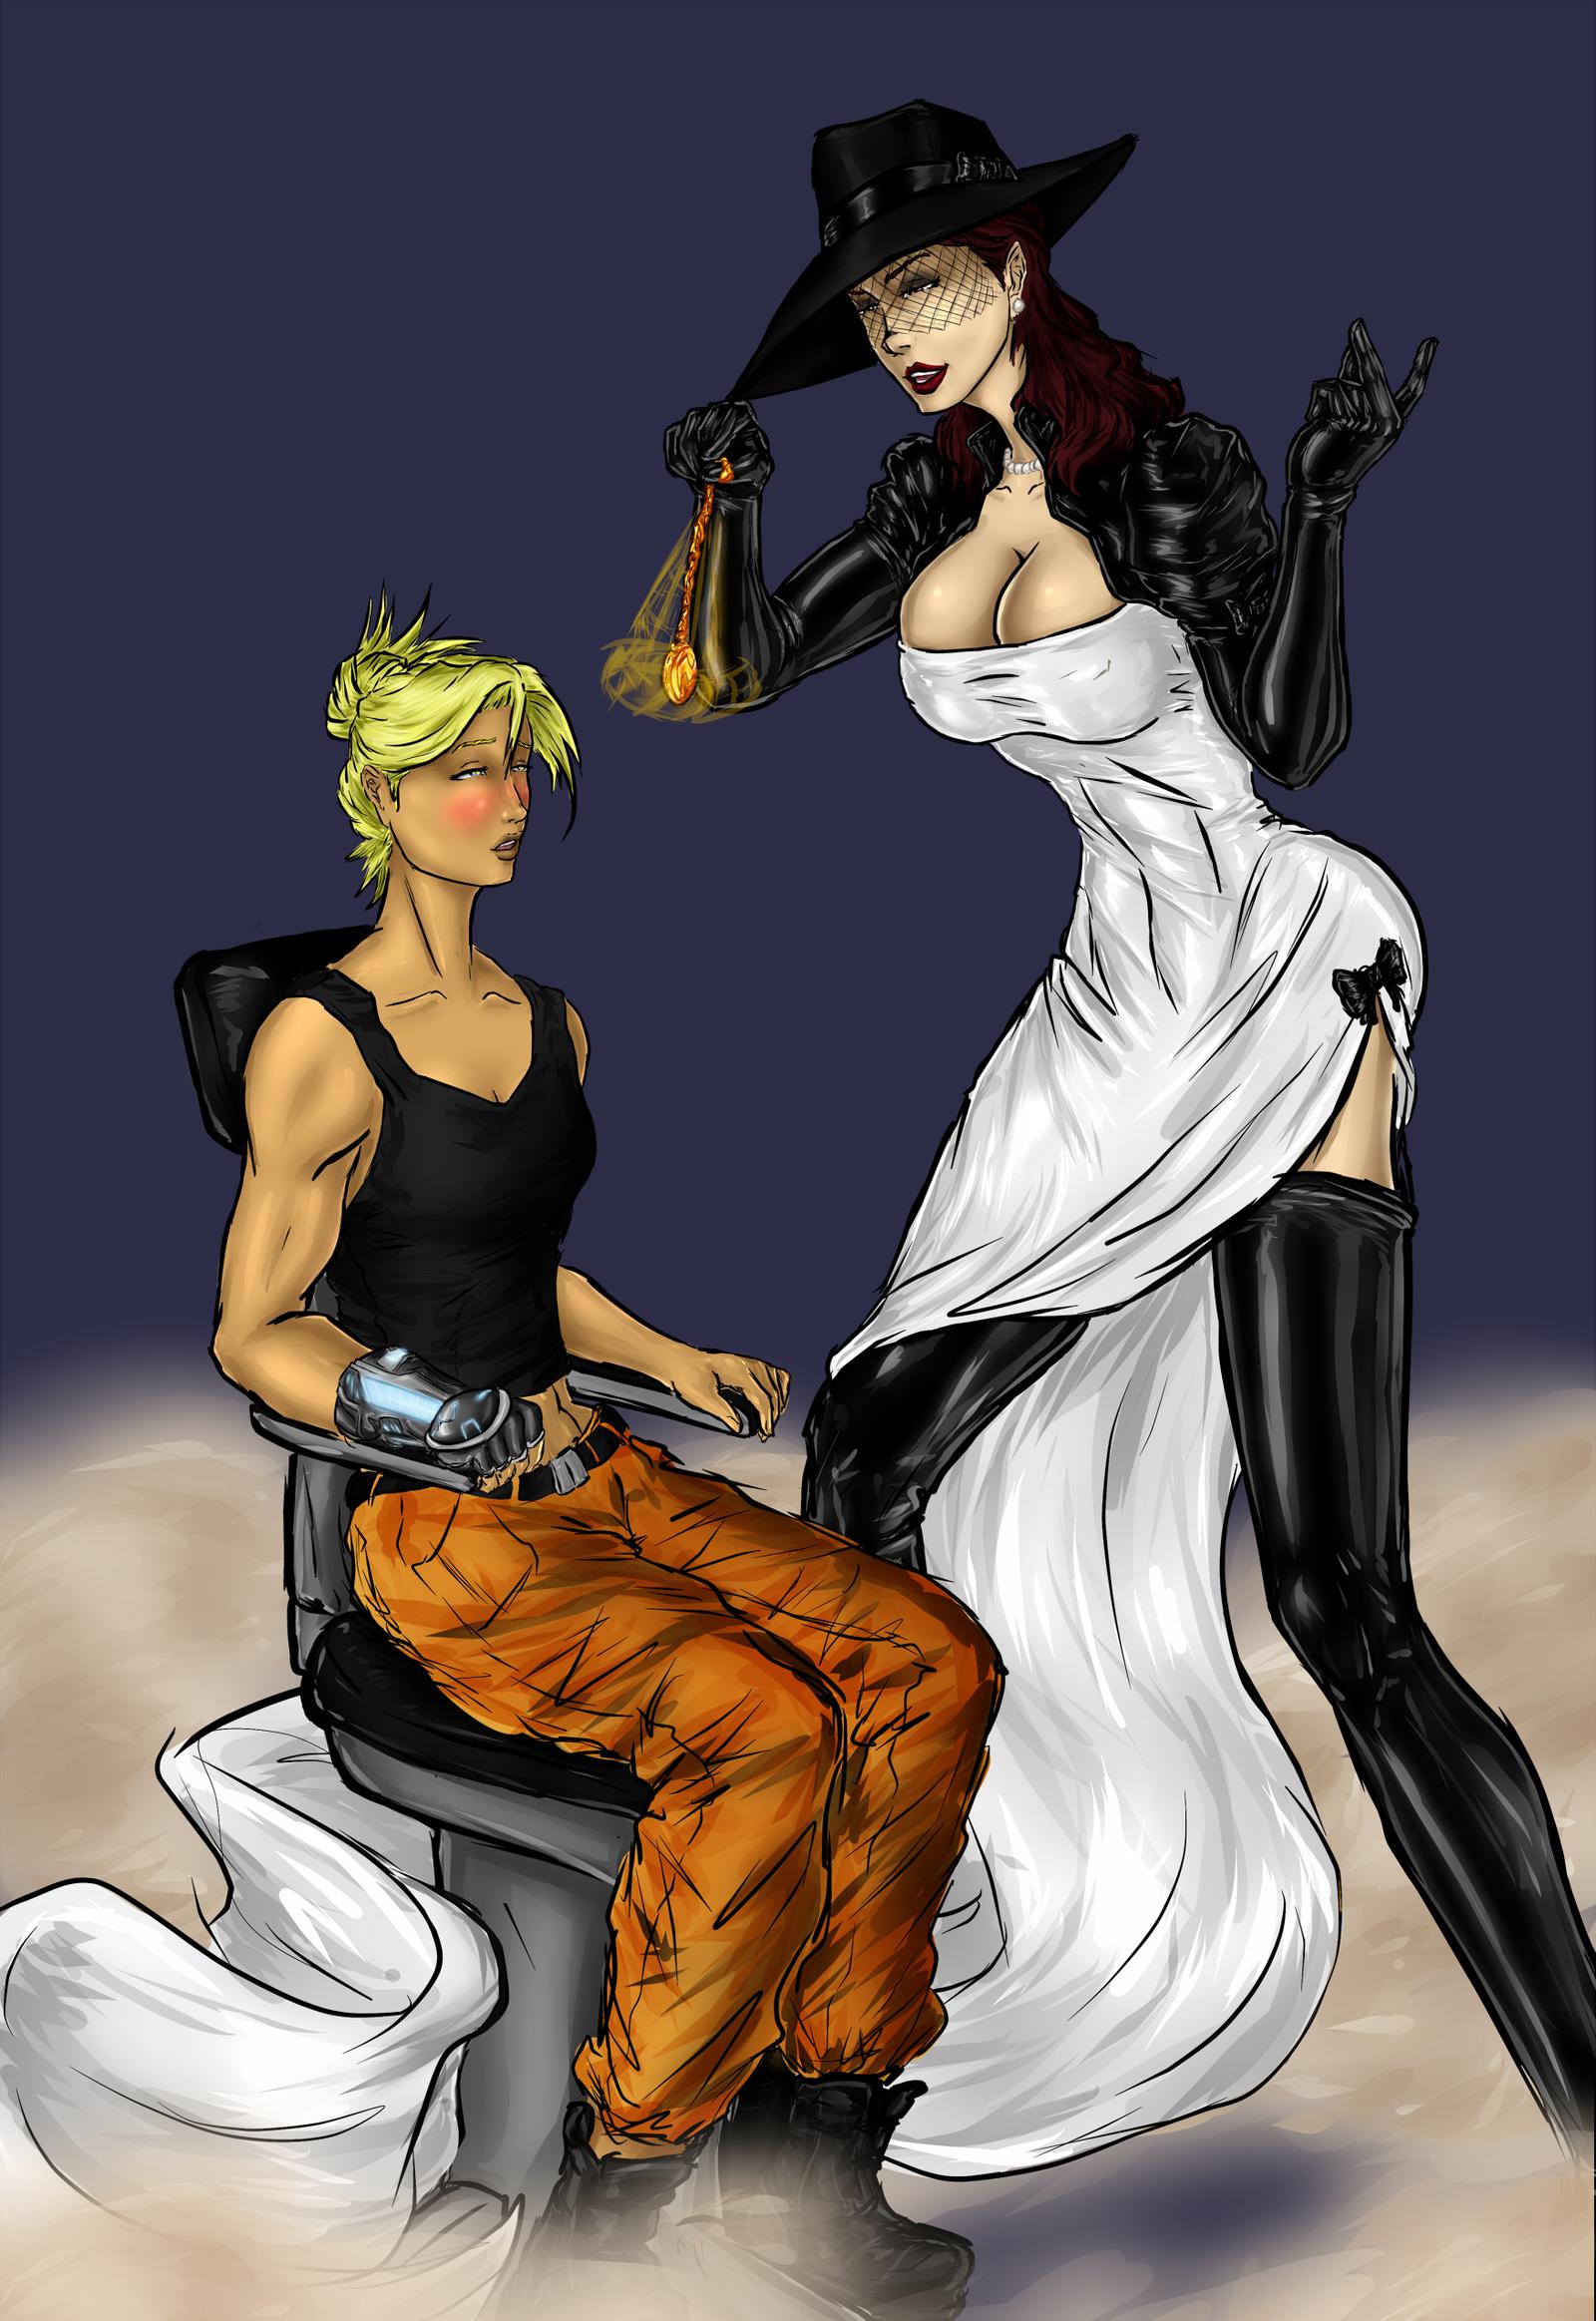 Mistress Mirage by RDishon on DeviantArt